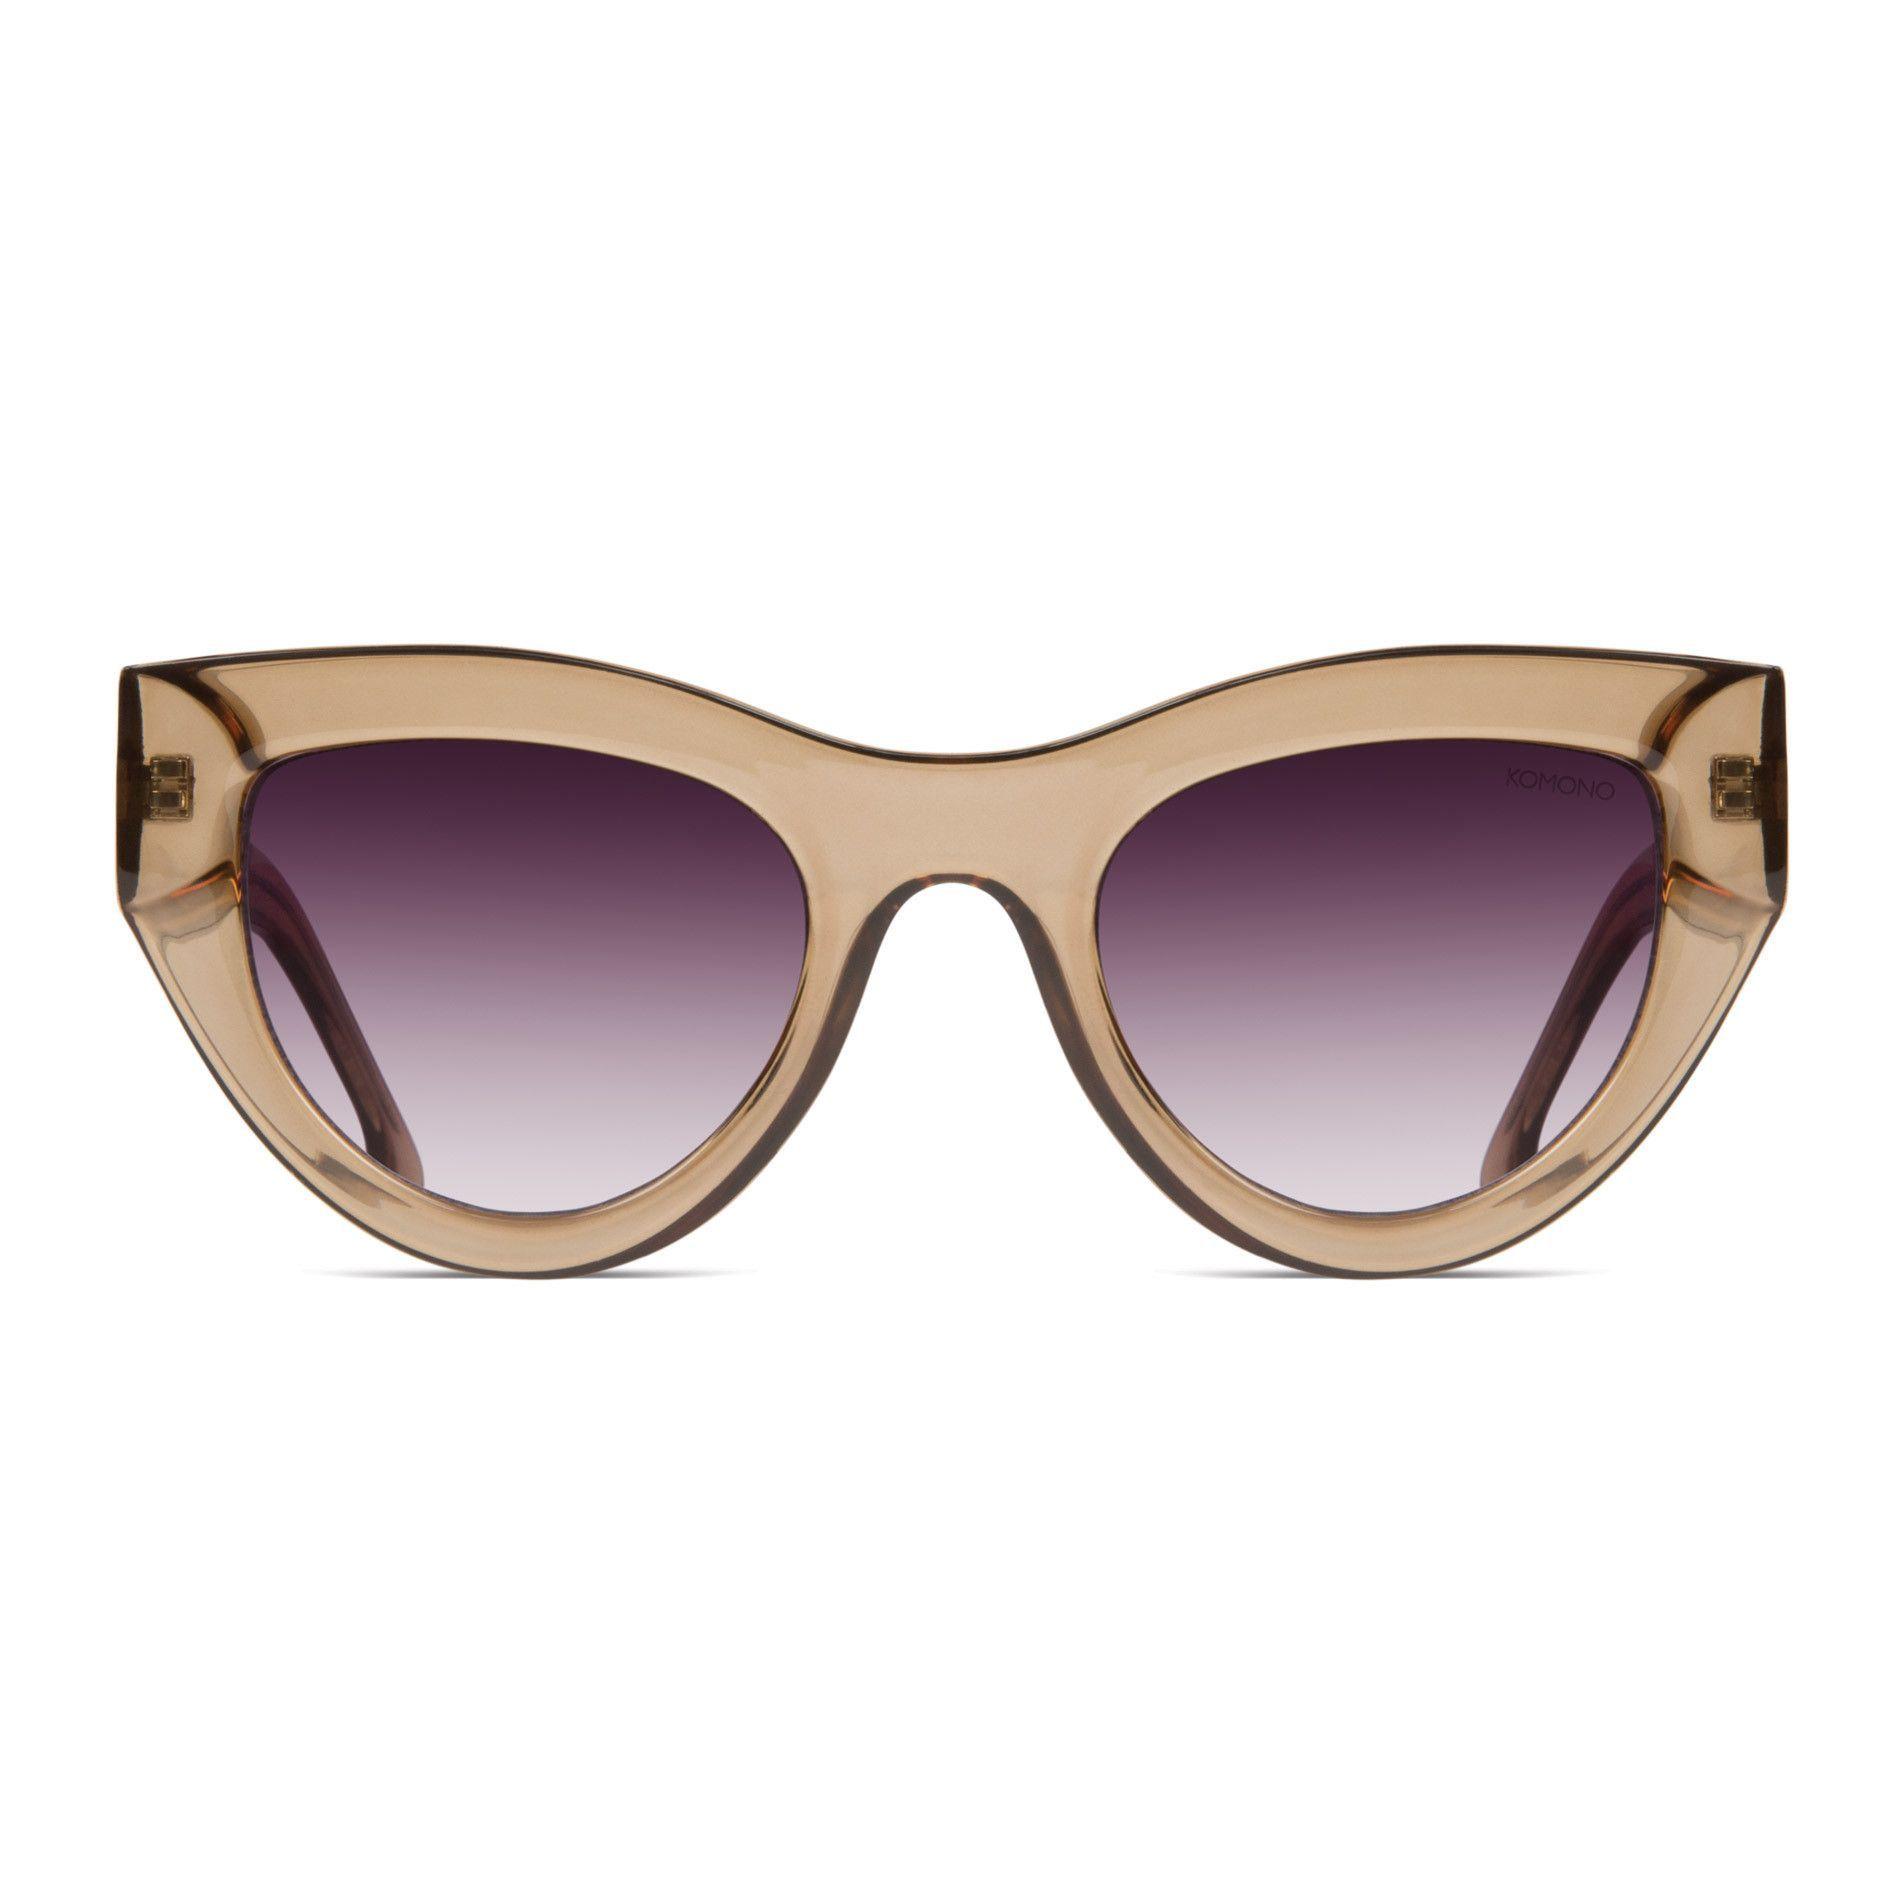 Komono Phoenix Sunglasses in Latte